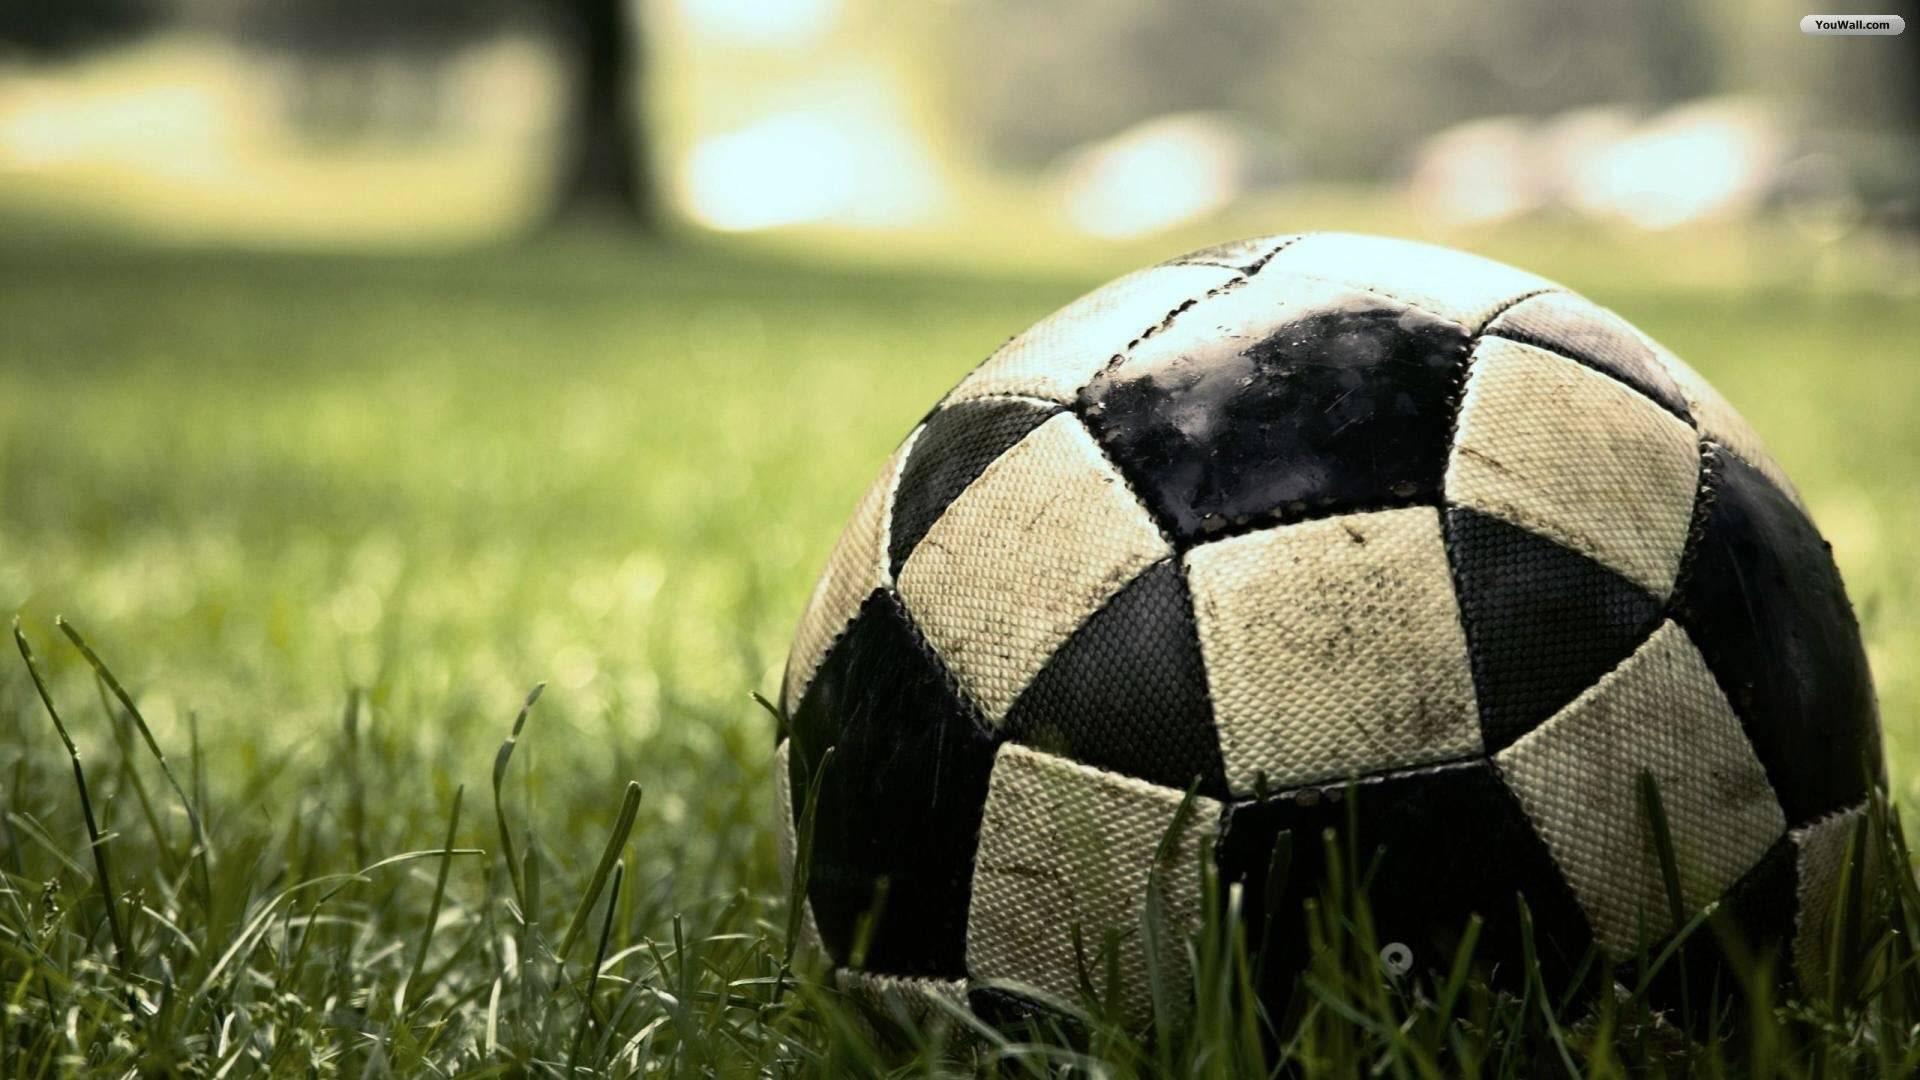 Soccer Ball Wallpapers: Soccer Wallpapers HD